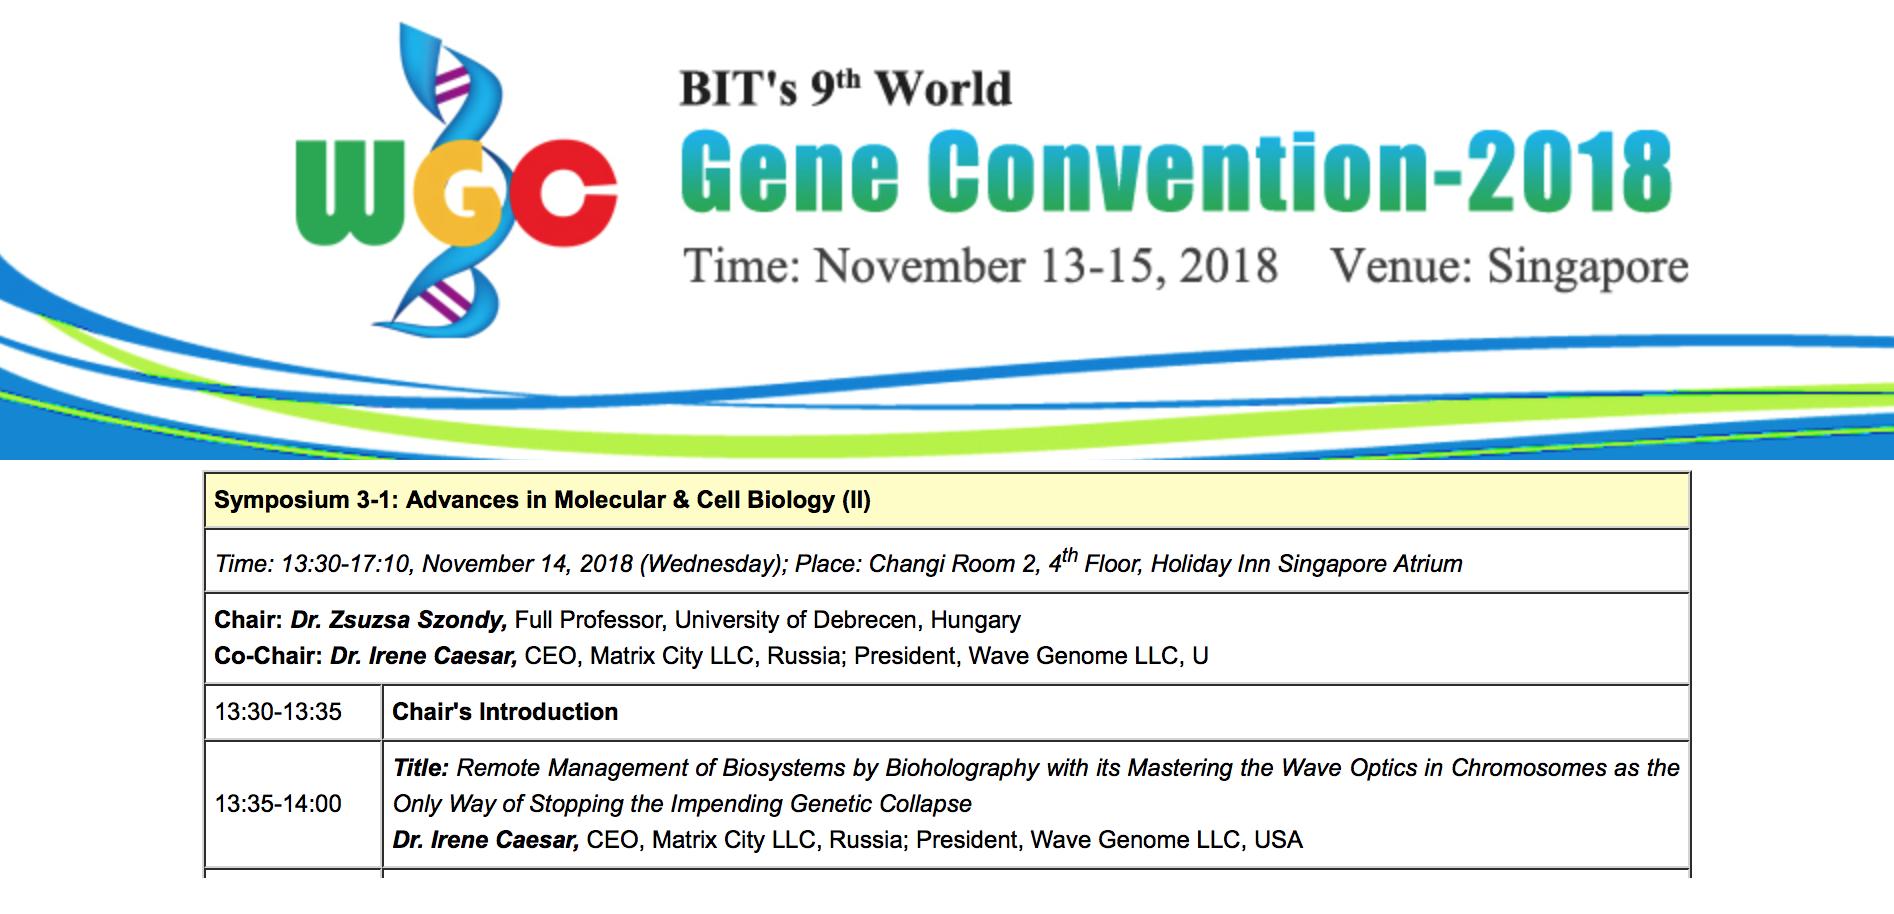 2018_11_14_irene_caesar_bit_9th_world_gene_convention_singapore_heading